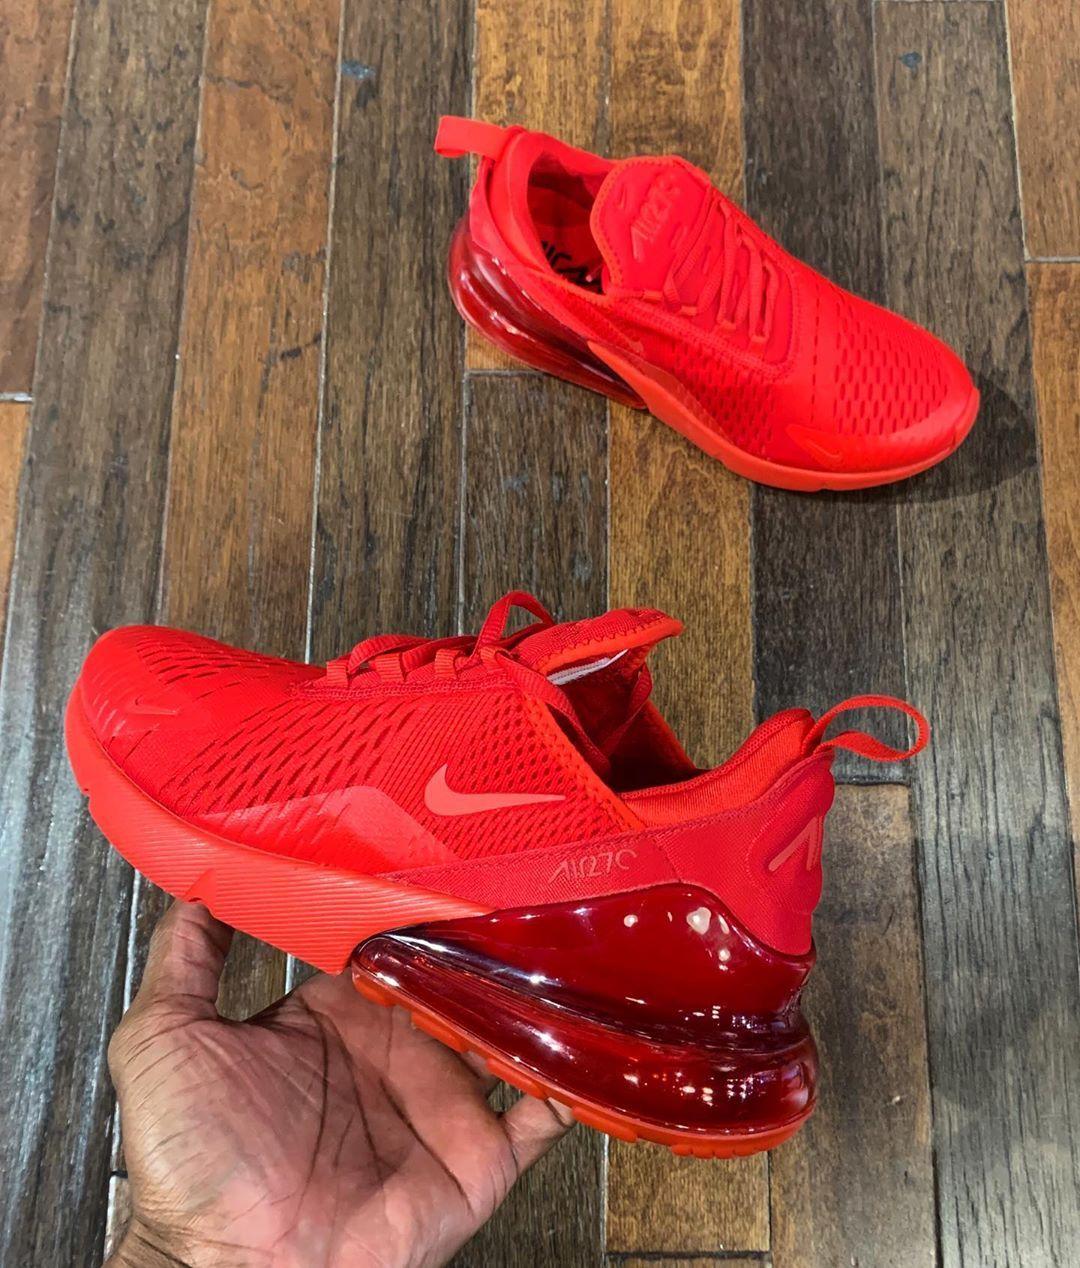 "Livekickz on Instagram: ""NIKE AIR MAX 270 TRIPLE RED ALL MEN ..."